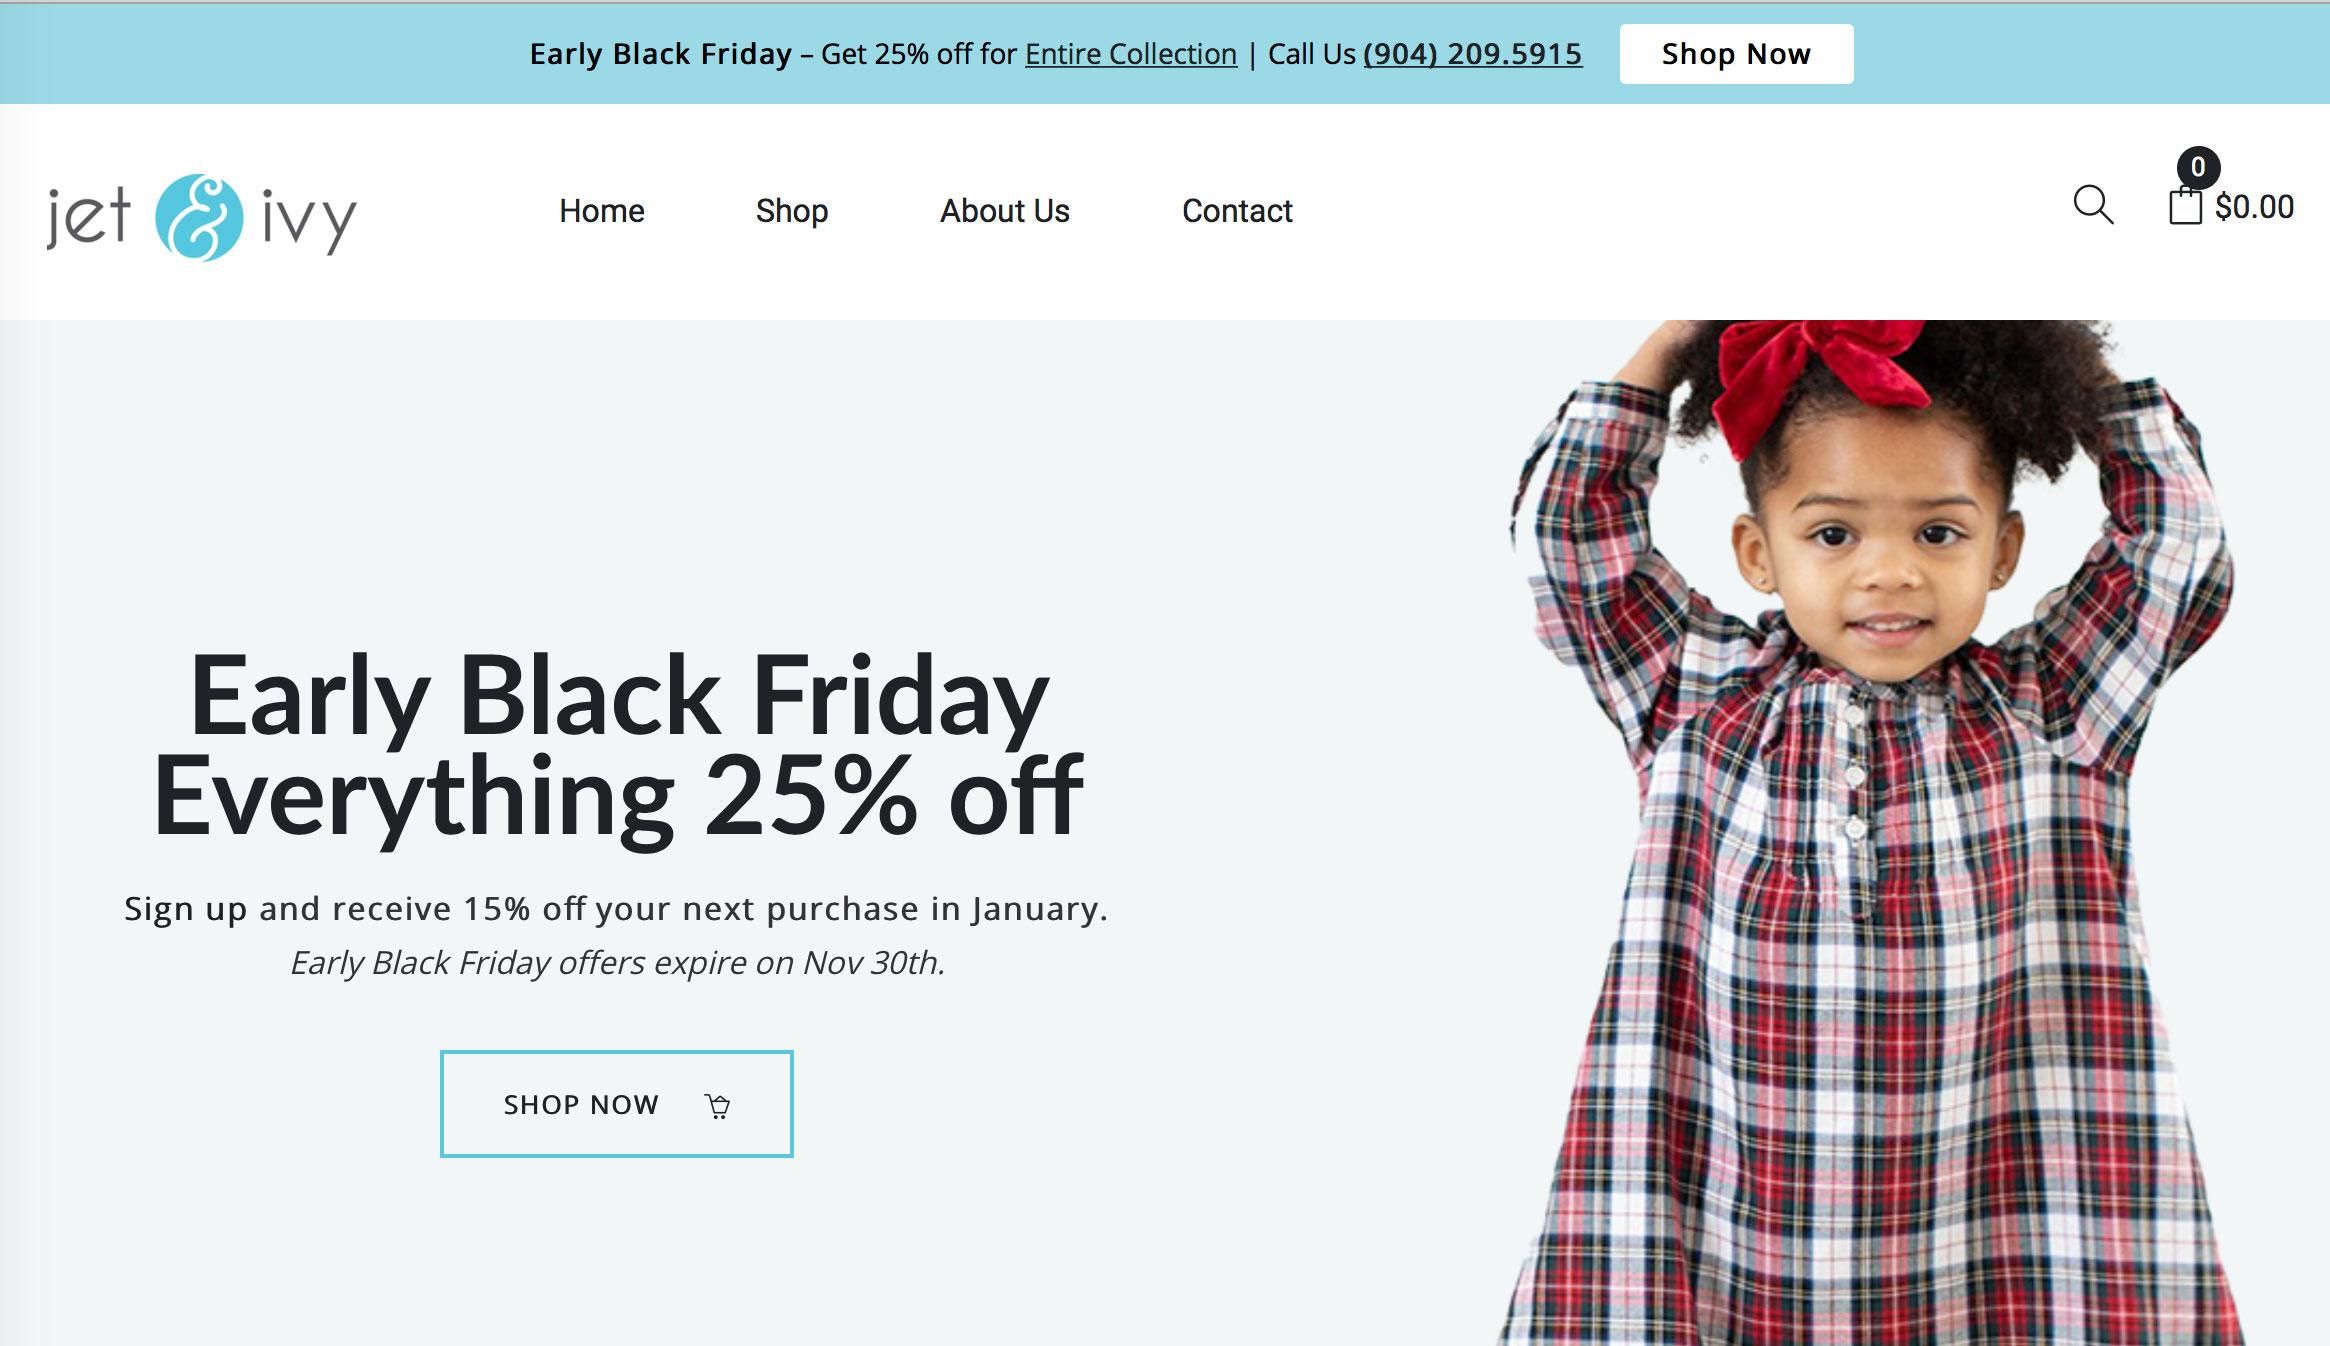 Jet Ivy childrens clothing image for blog